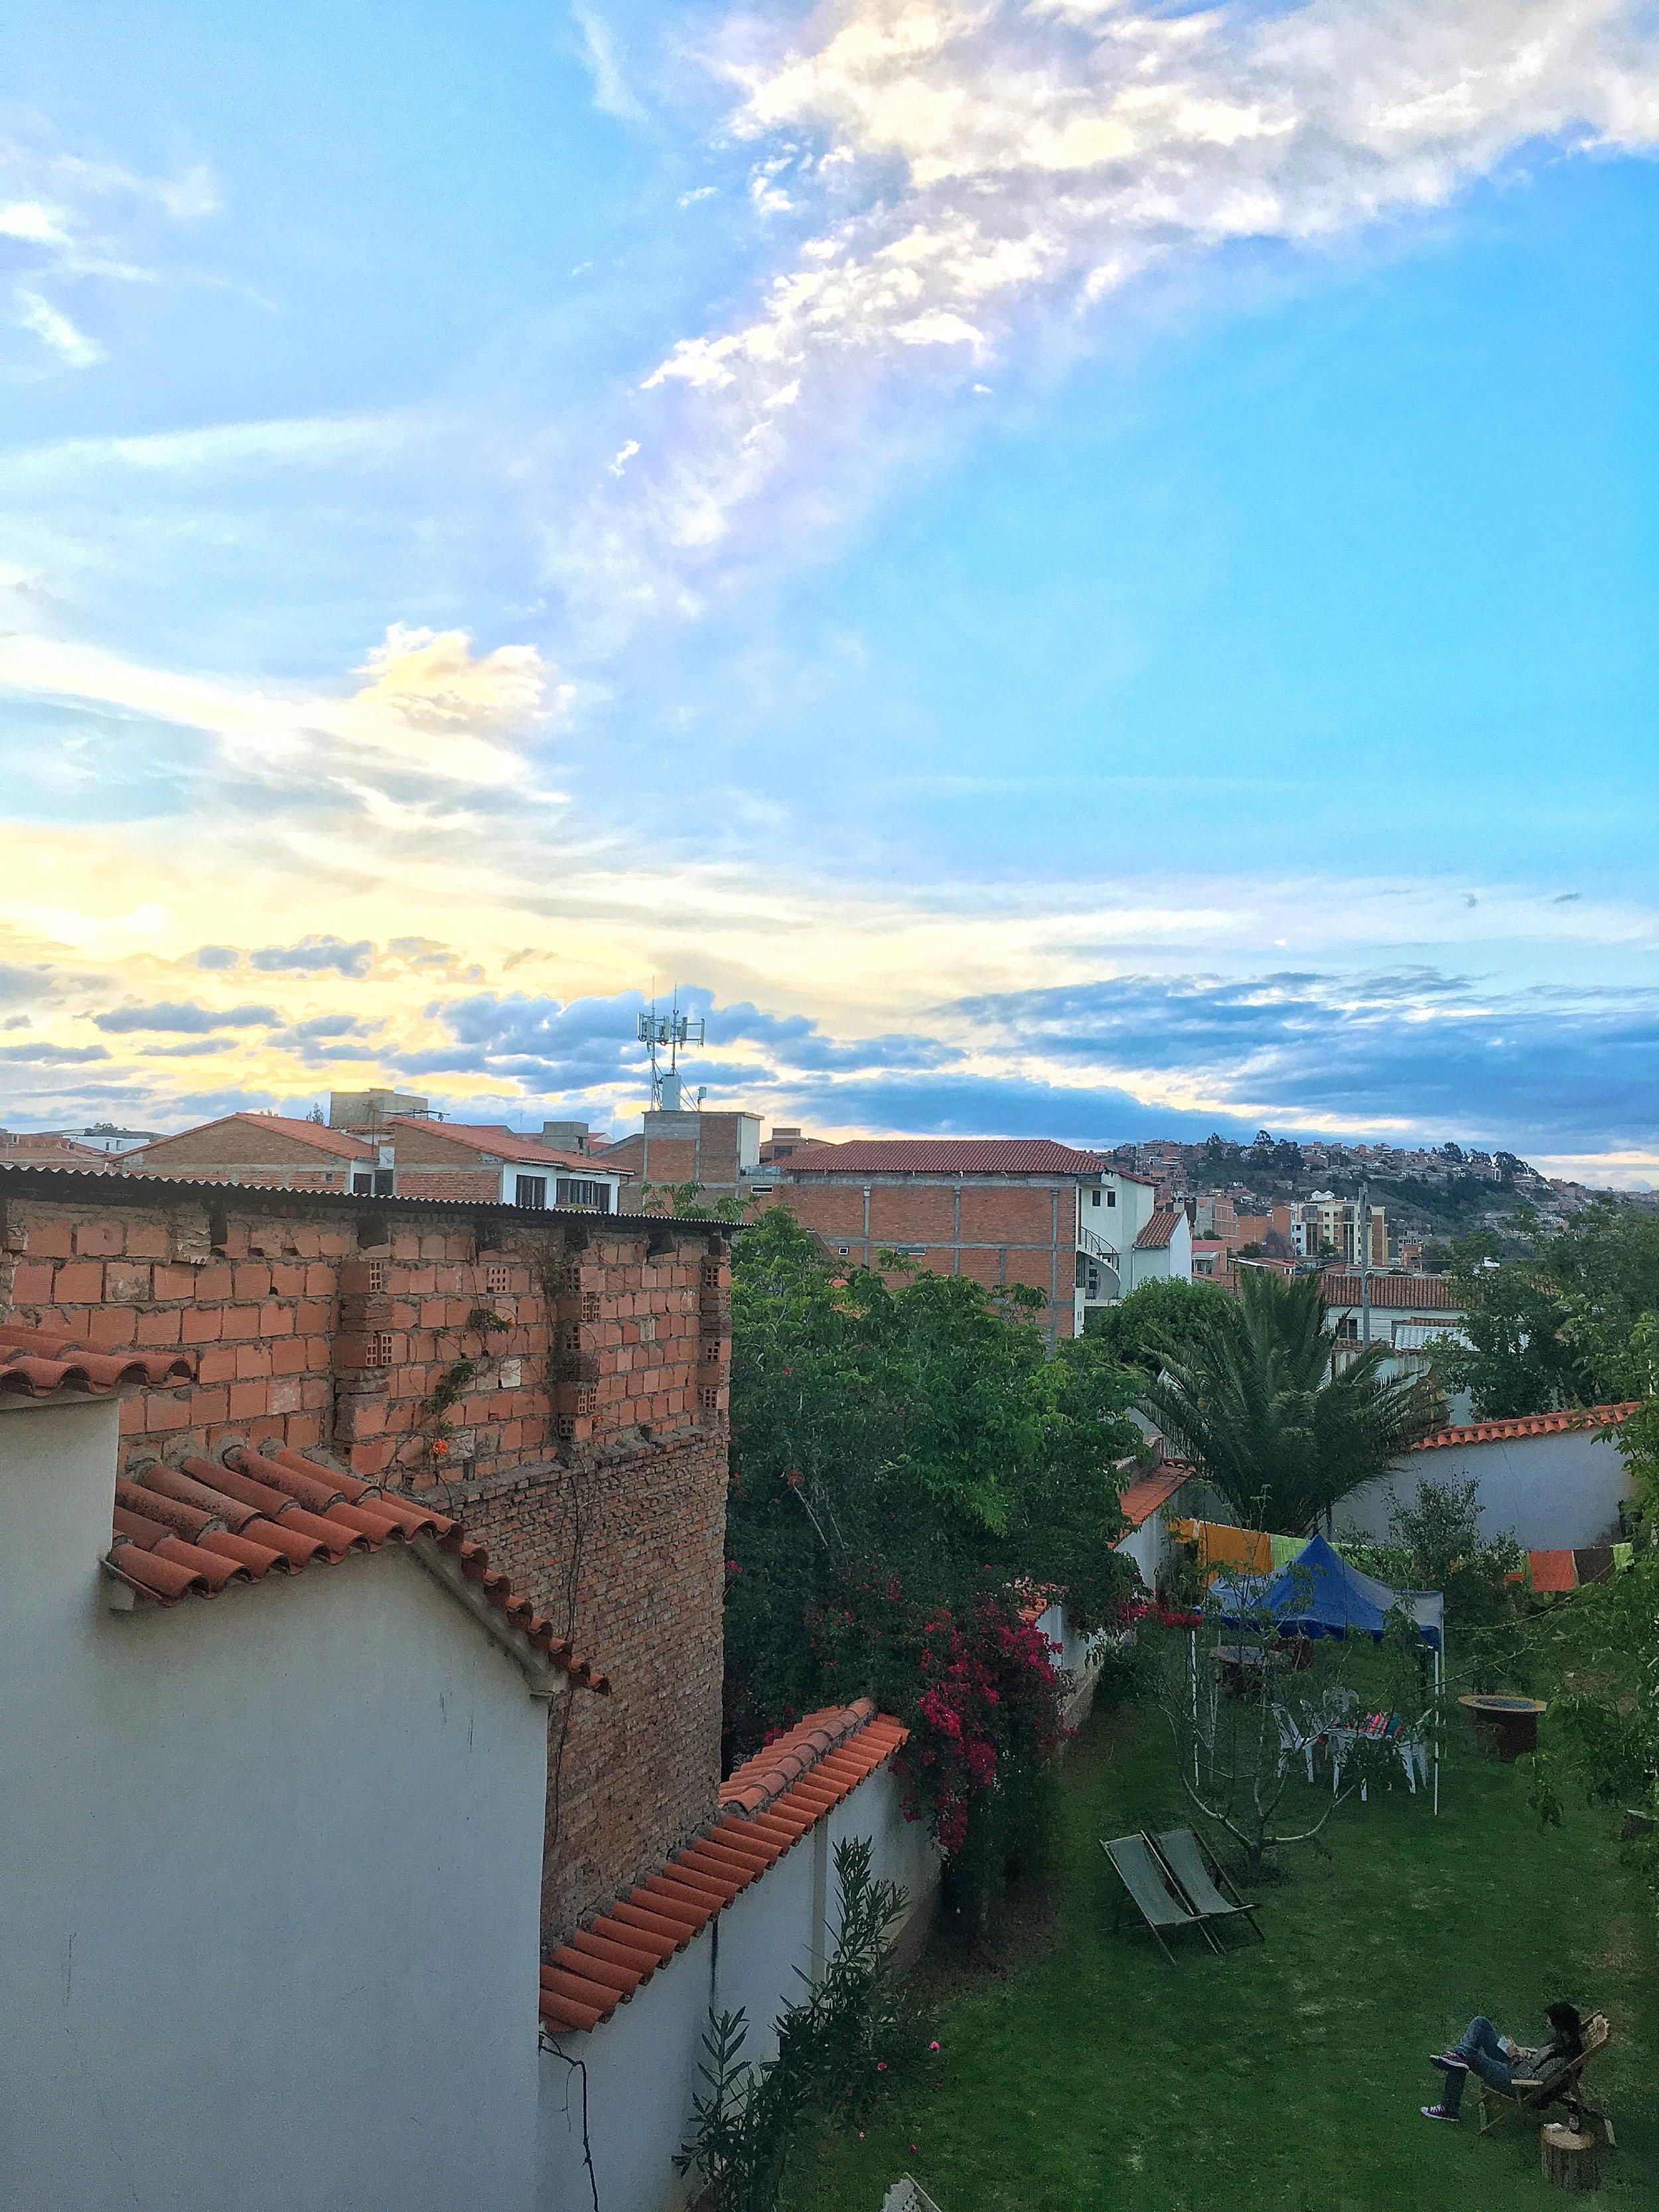 Cozy views from the Villa Oro Preza Hostal